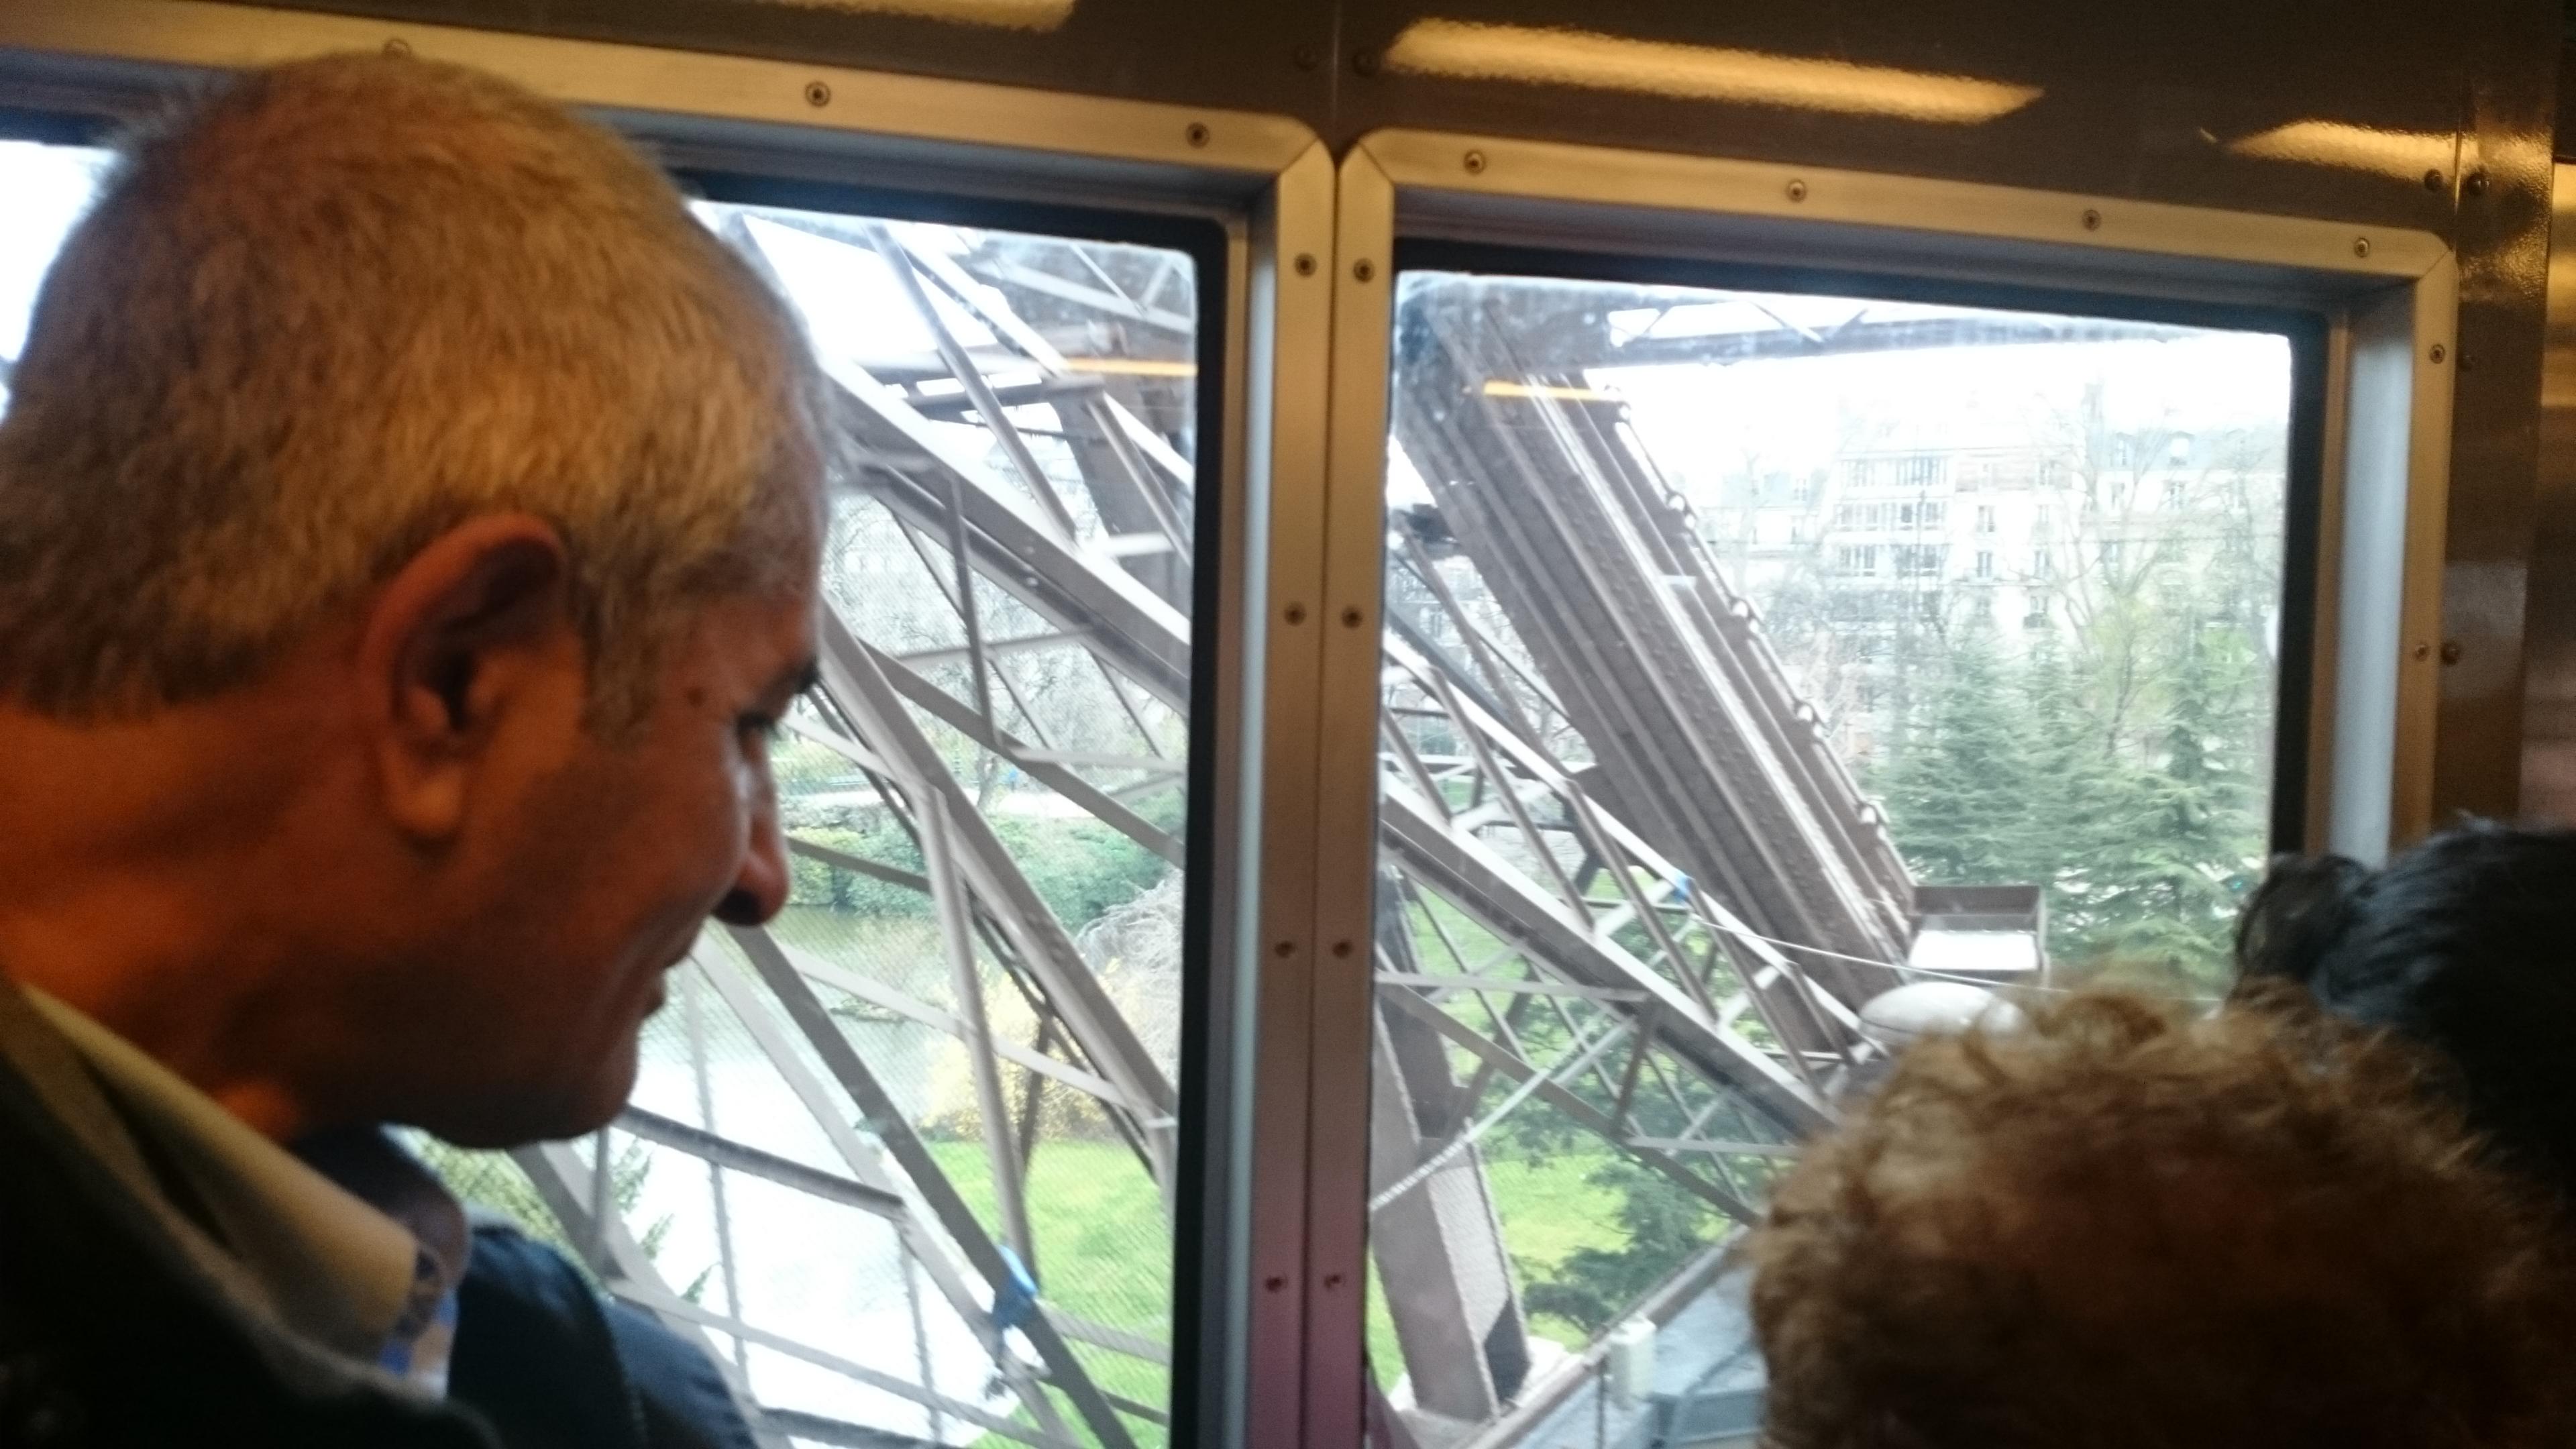 DSC 1895 - Visitando la Torre Eiffel en Paris